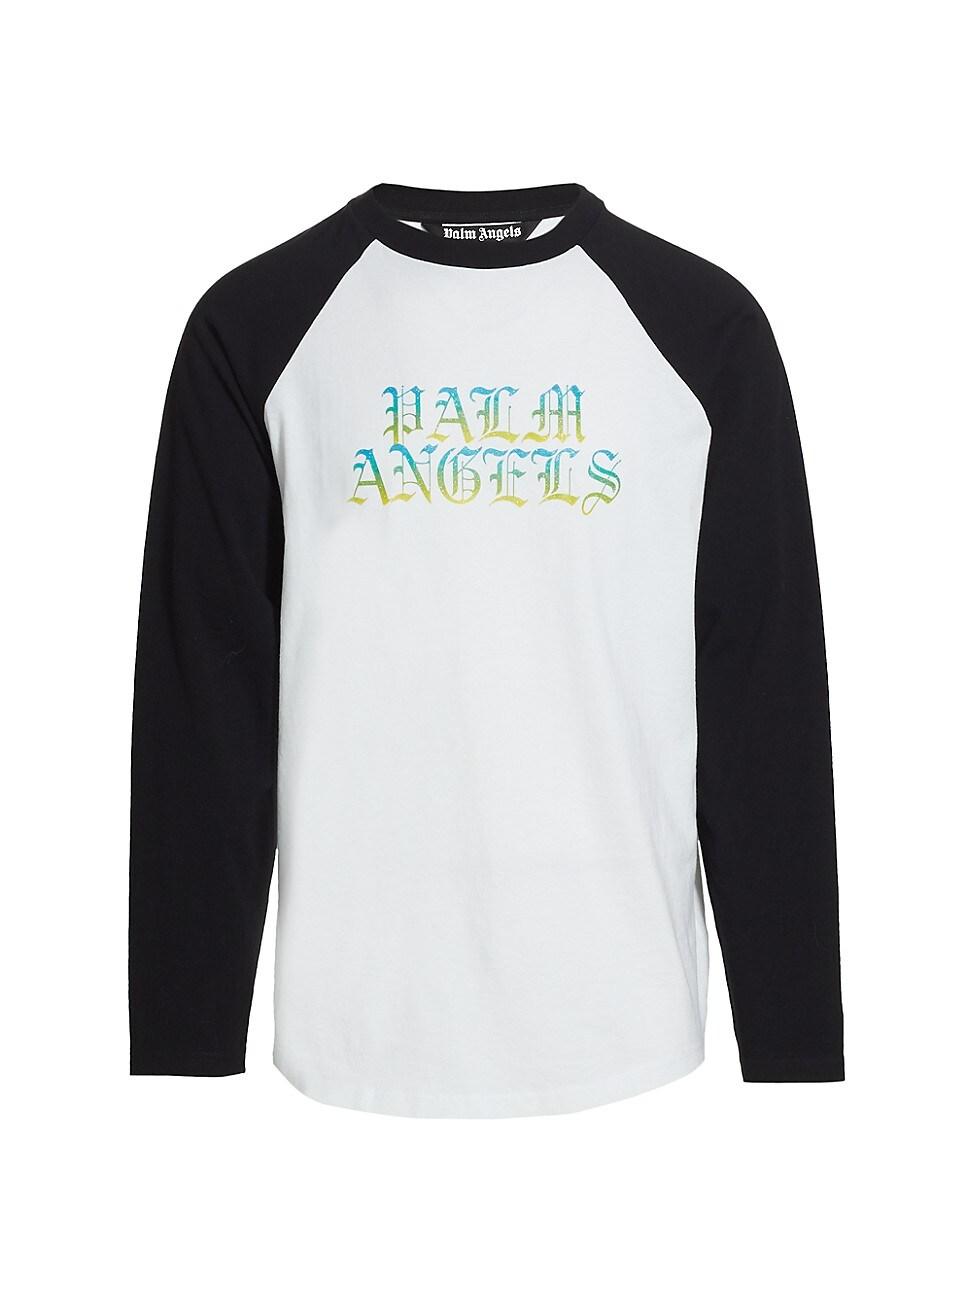 PALM ANGELS MEN'S HUE GOTHIC LOGO LONG-SLEEVE T-SHIRT